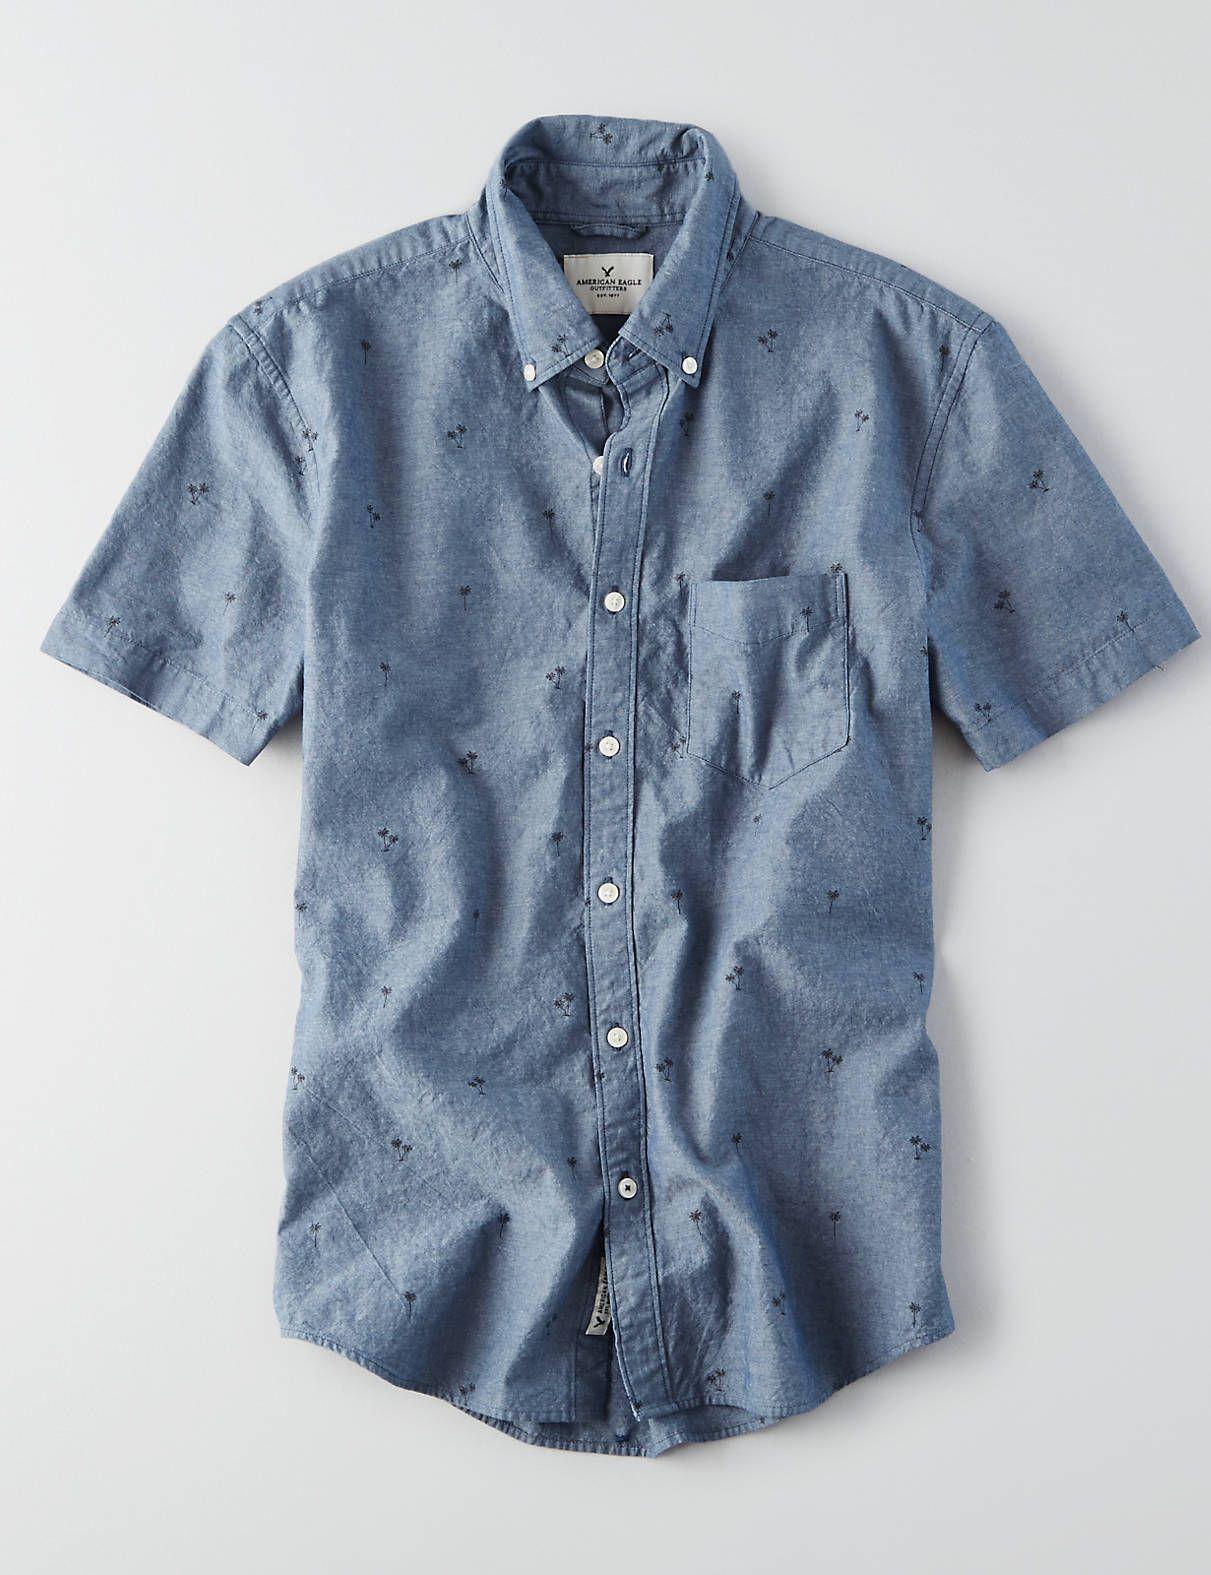 AEO Pattern Short Sleeve Shirt, Washed Blue | American Eagle ...